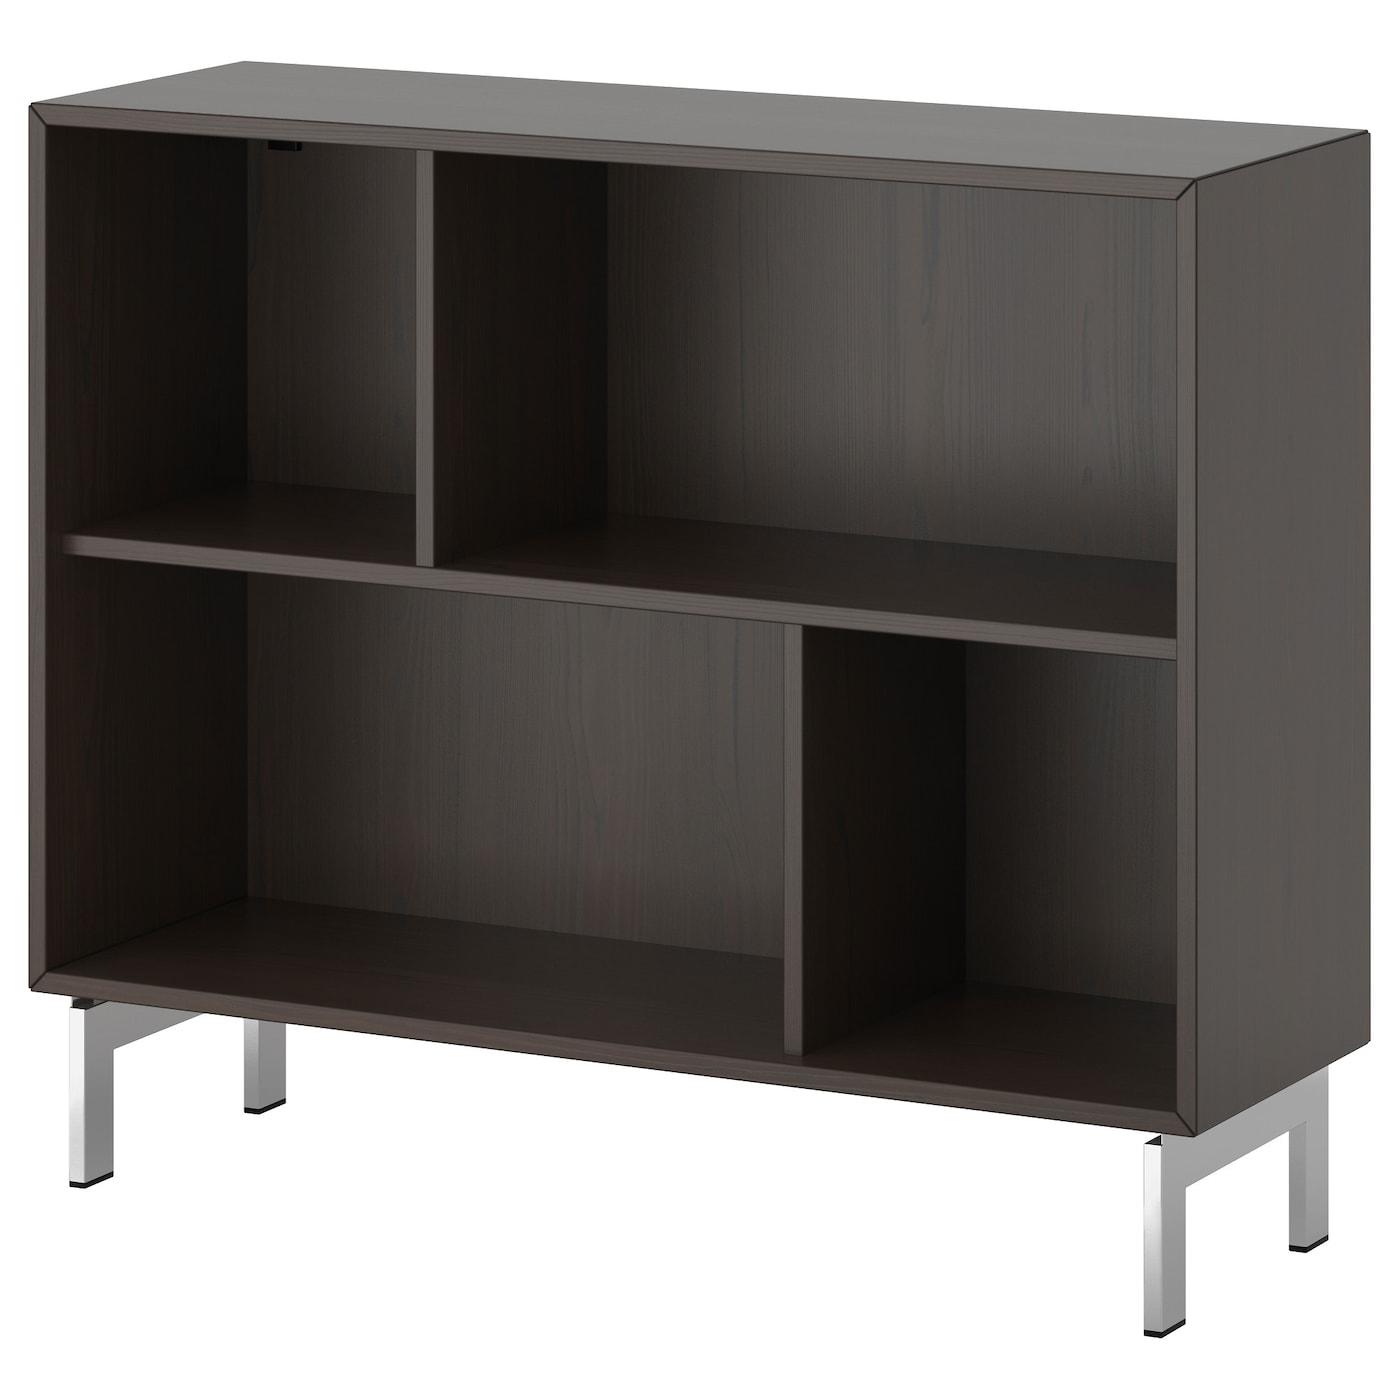 Good IKEA VALJE Shelf Unit Optimise Your Storage With PALLRA Boxes, Or PALLRA  Mini Chests.